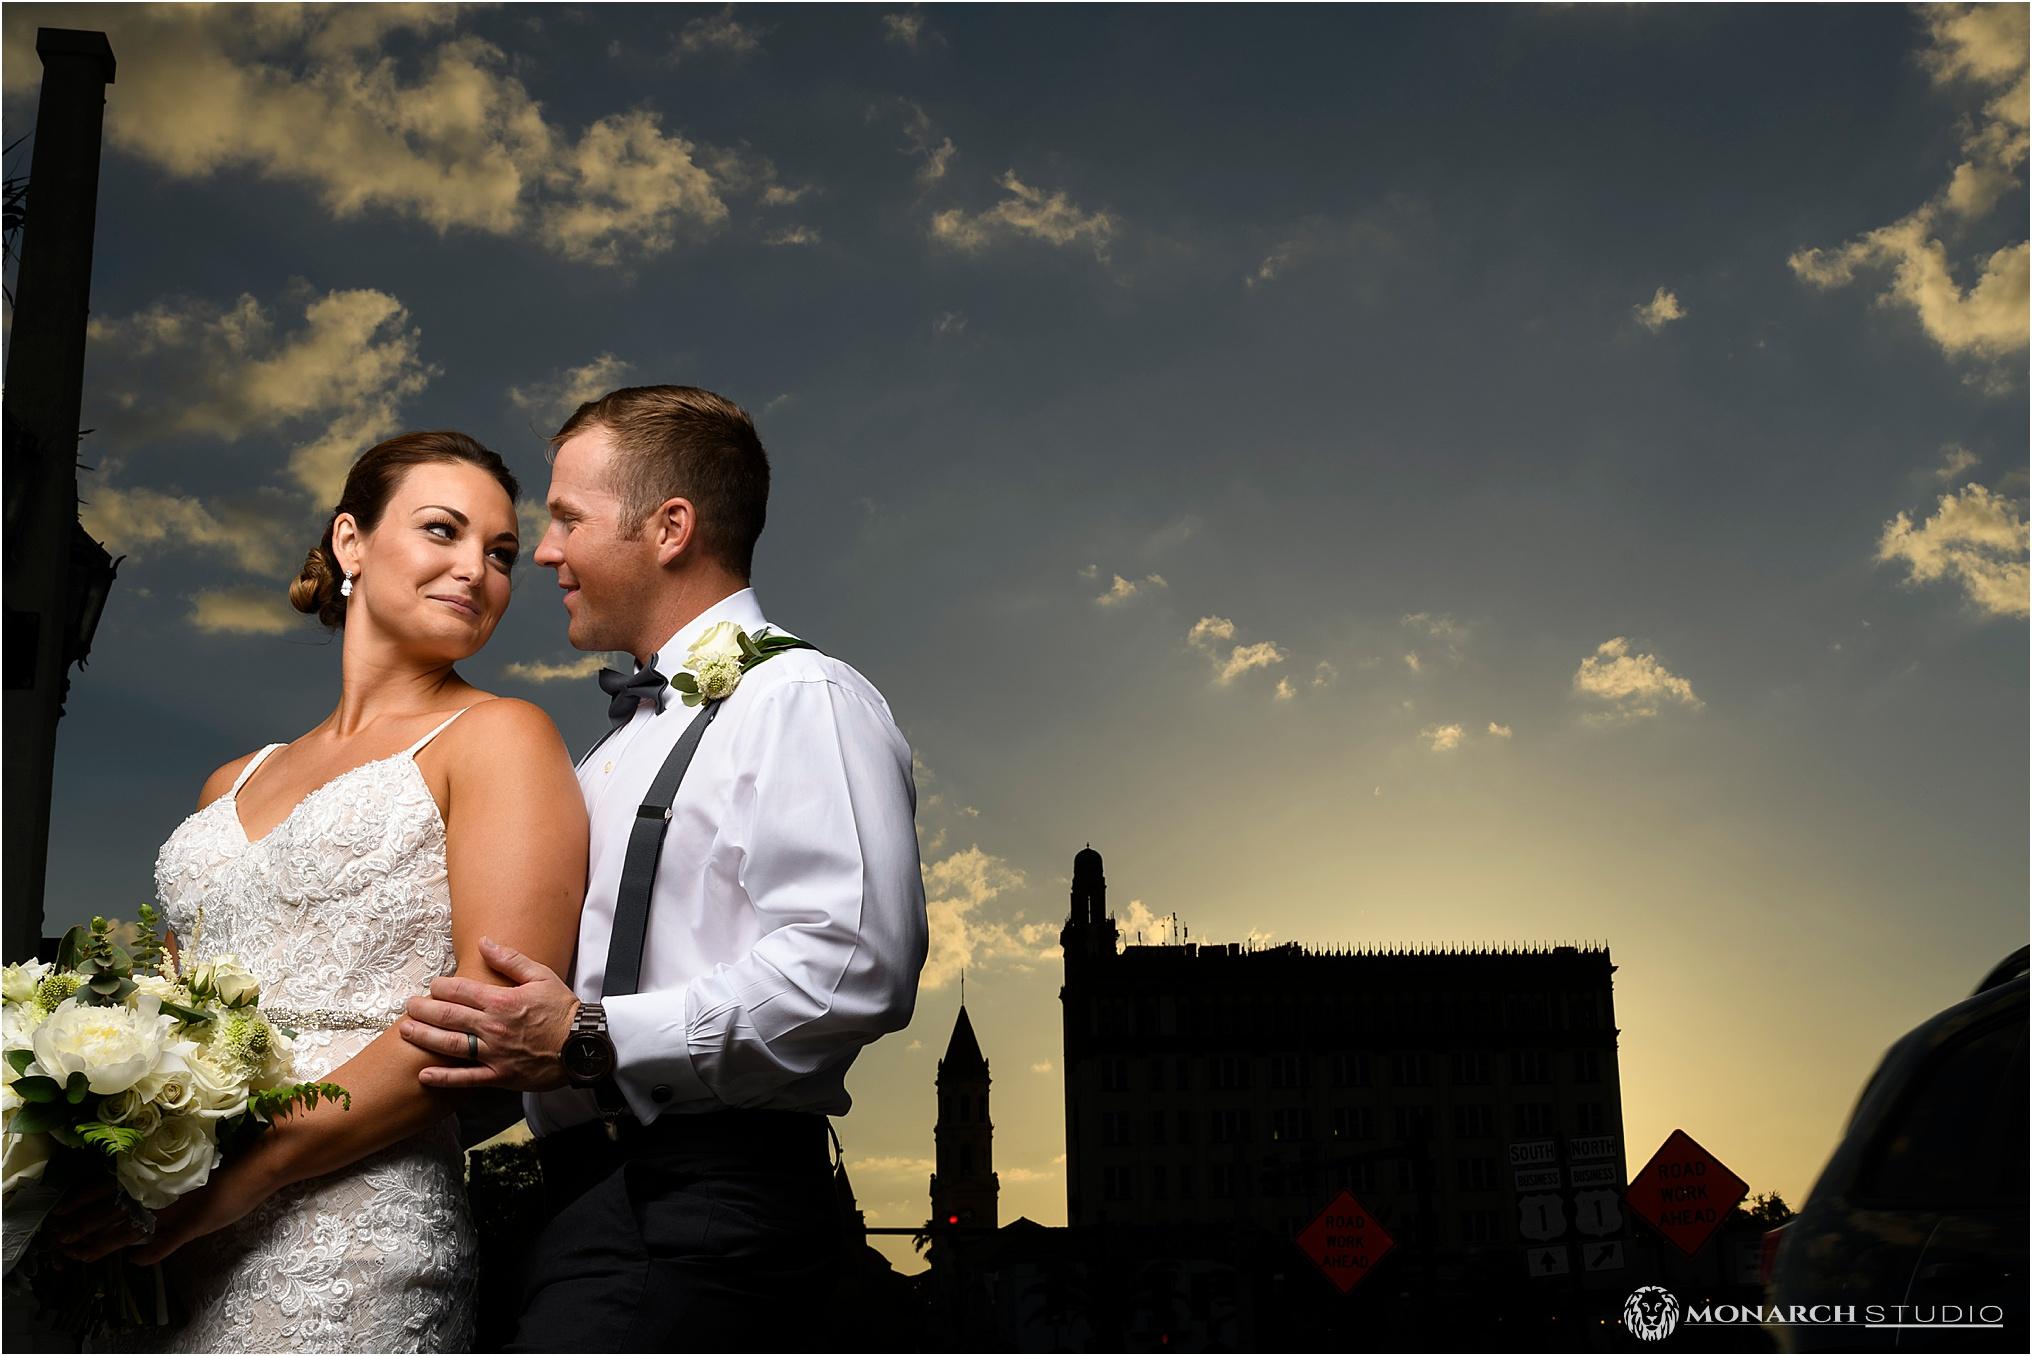 088-whiteroom-wedding-photographer-2019-05-22_0070.jpg